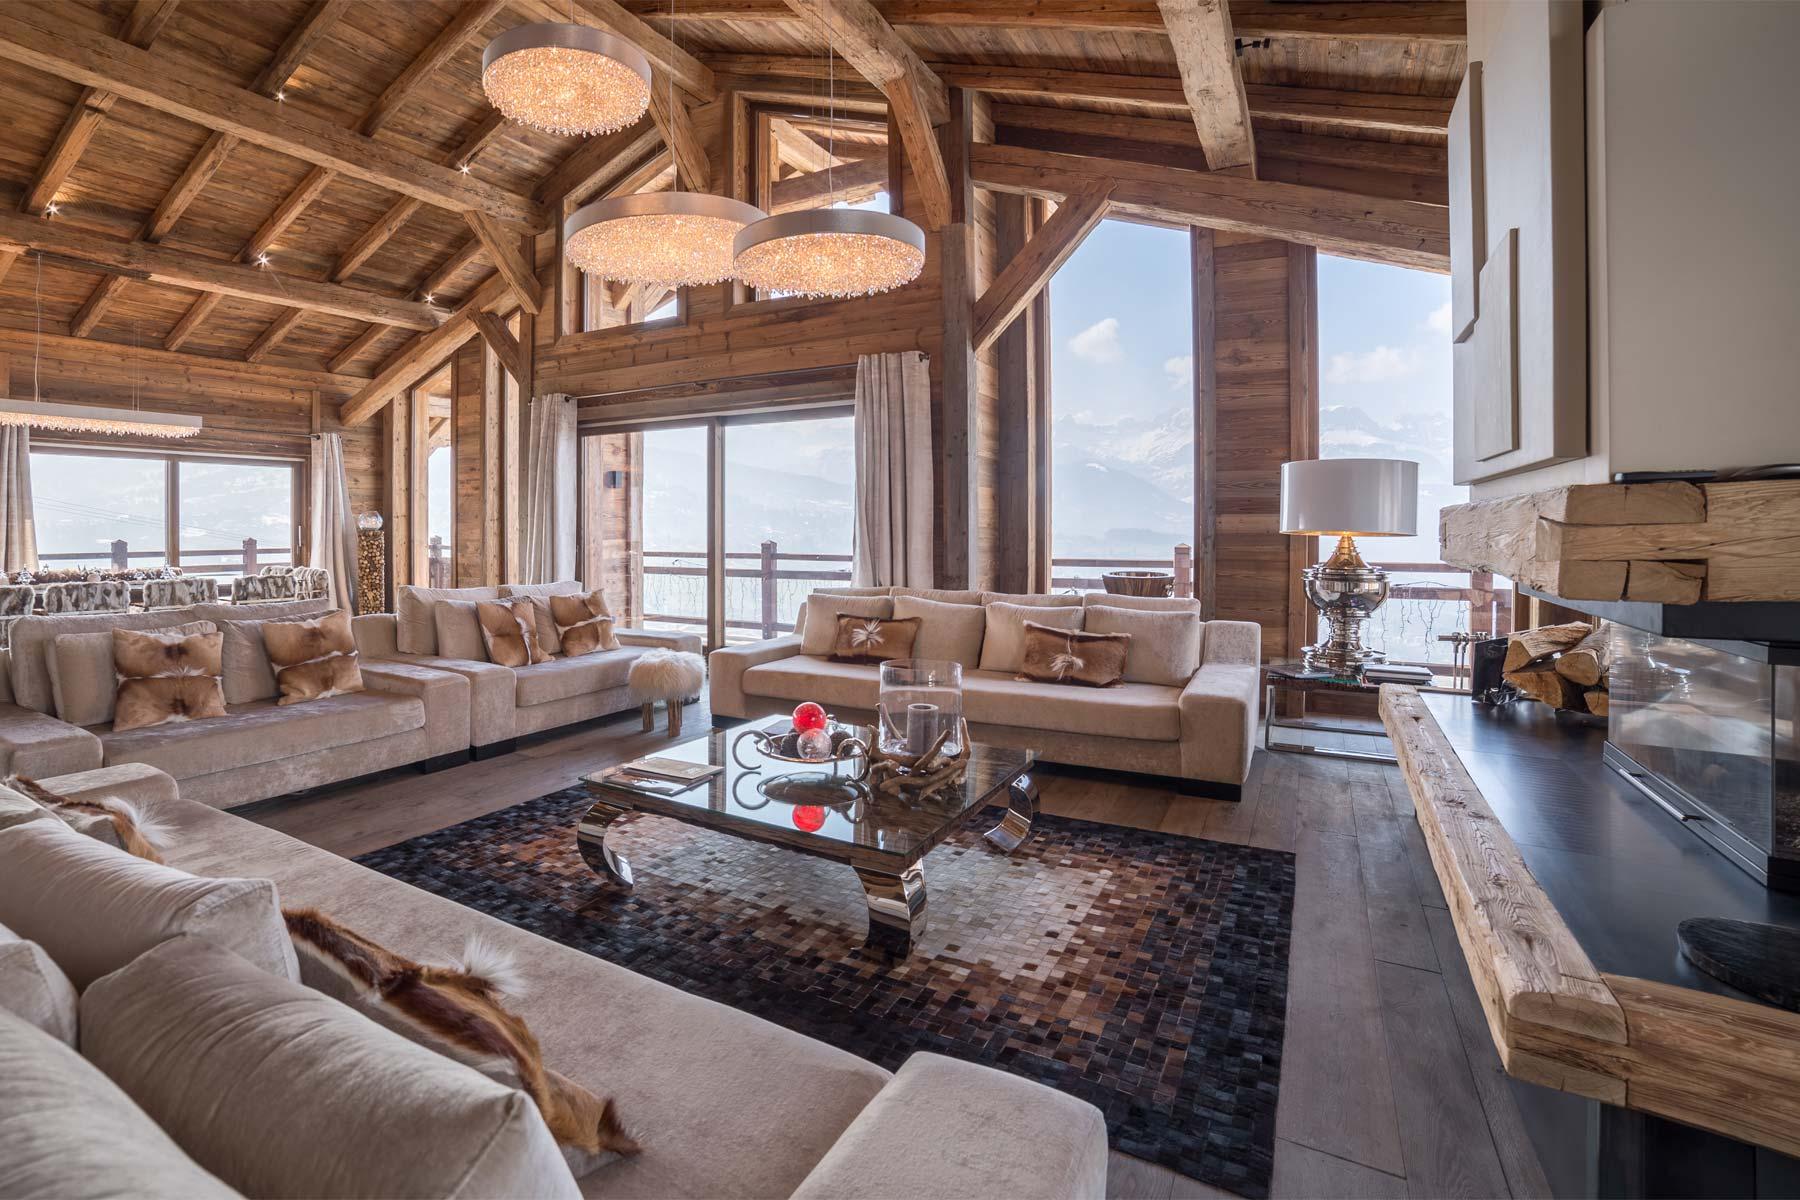 Immobilier de luxe paris londres miami - Appartement de luxe miami beach m butler ...